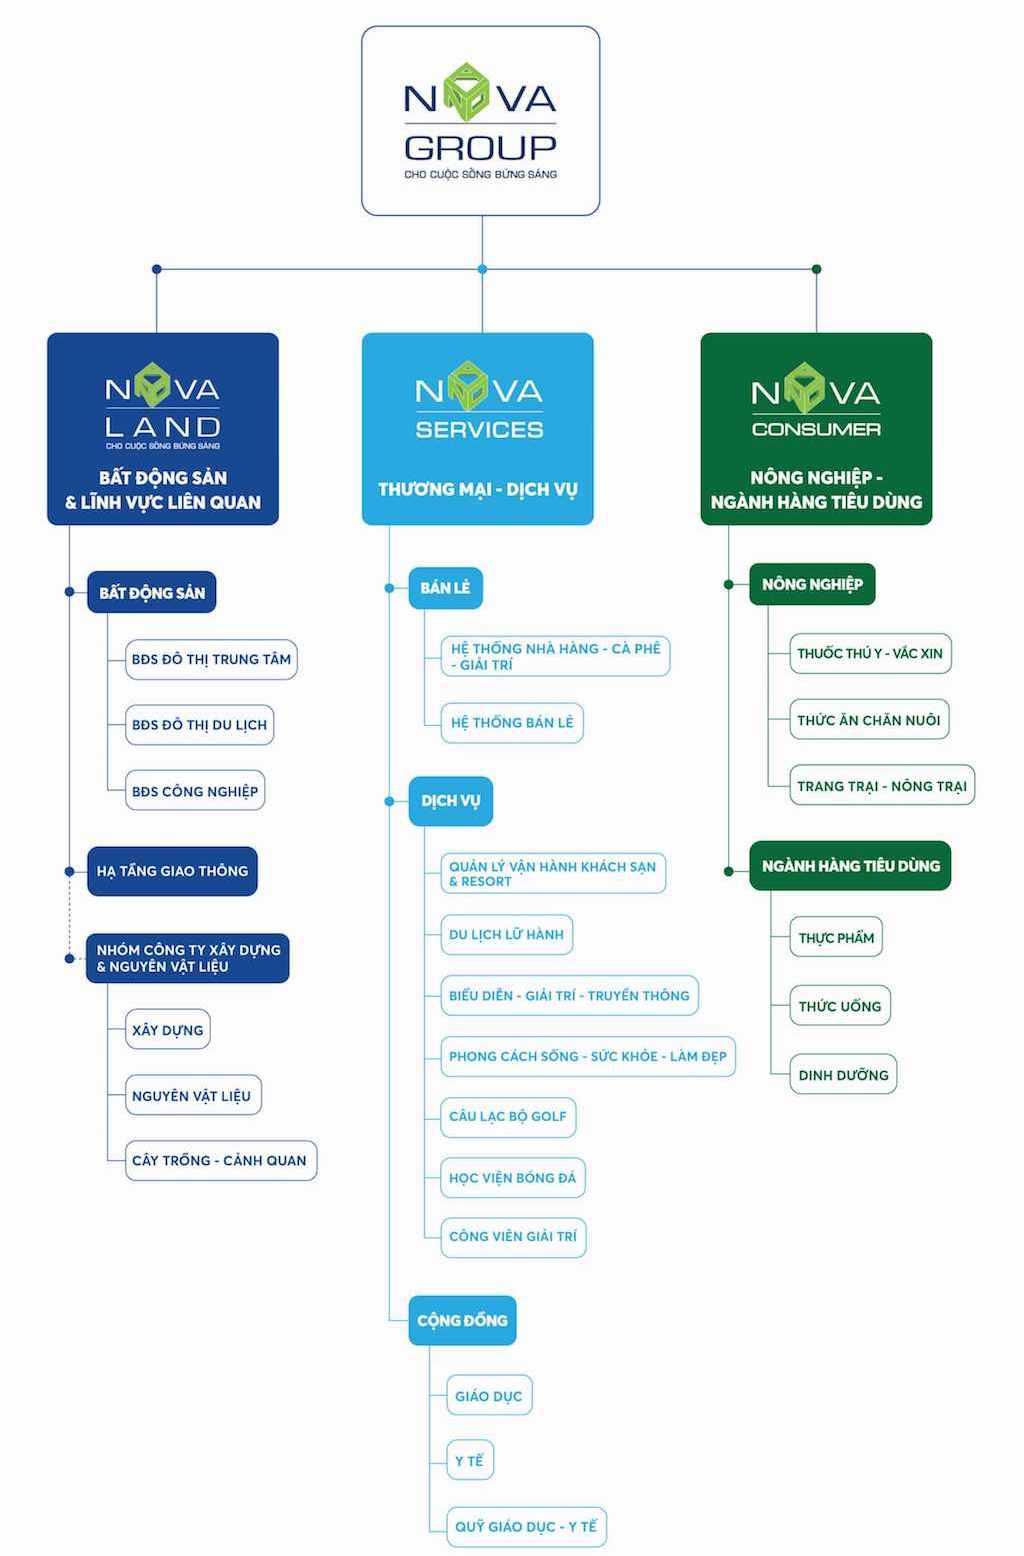 Tập đoàn NovaGroup tái cấu trúc NovaLand Group, Nova Consumer Group, Nova Service Group